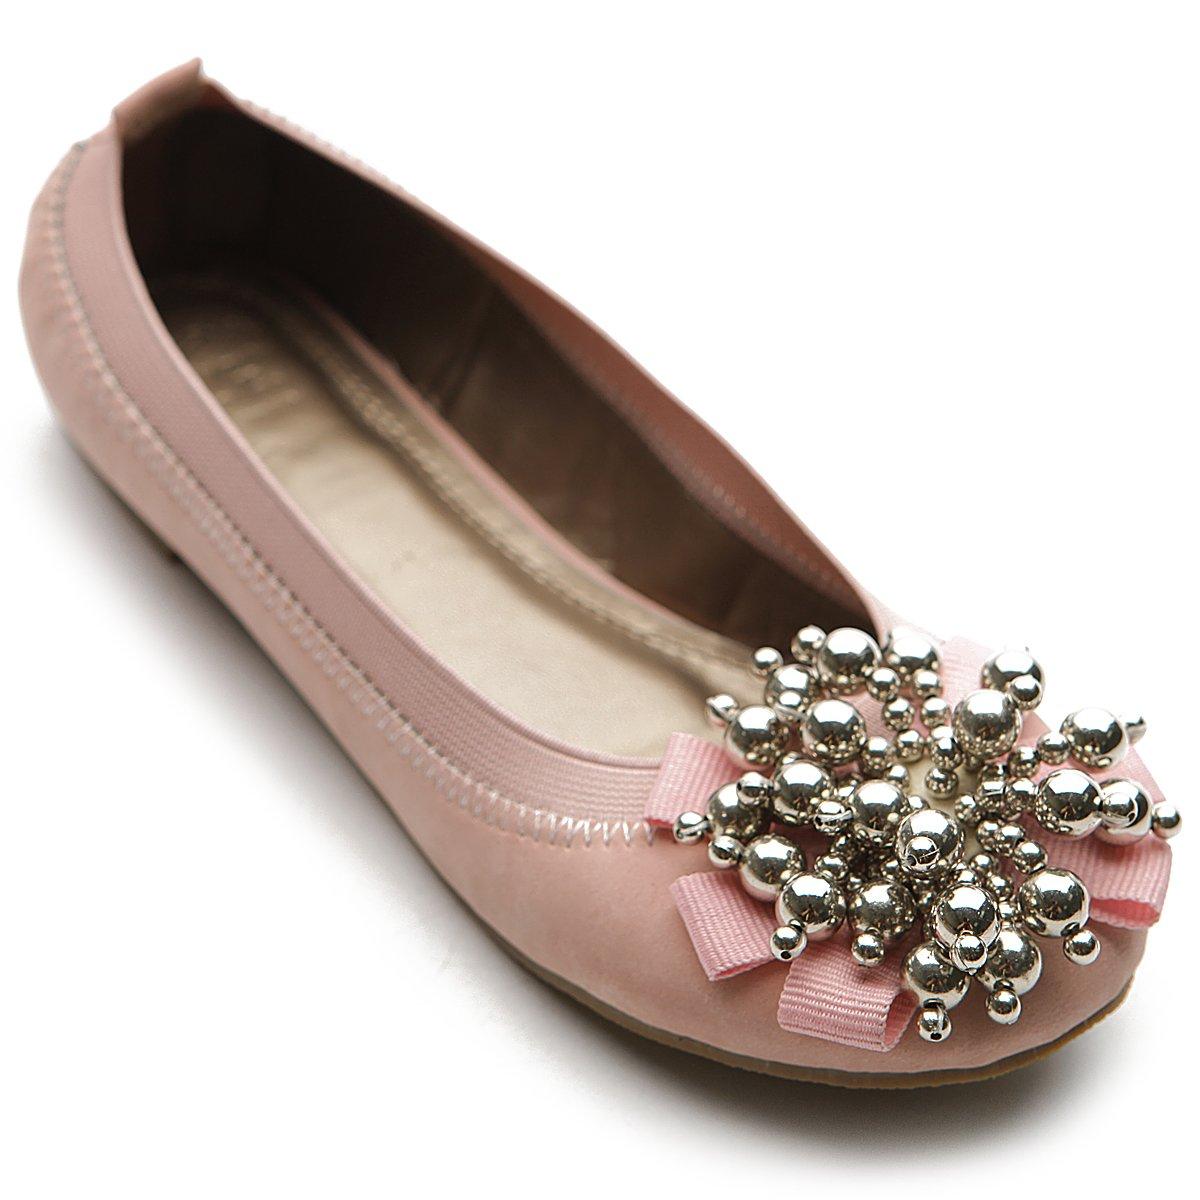 Ollio Women's Ballet Shoe Soft Cute Silver Bead Accent Flat